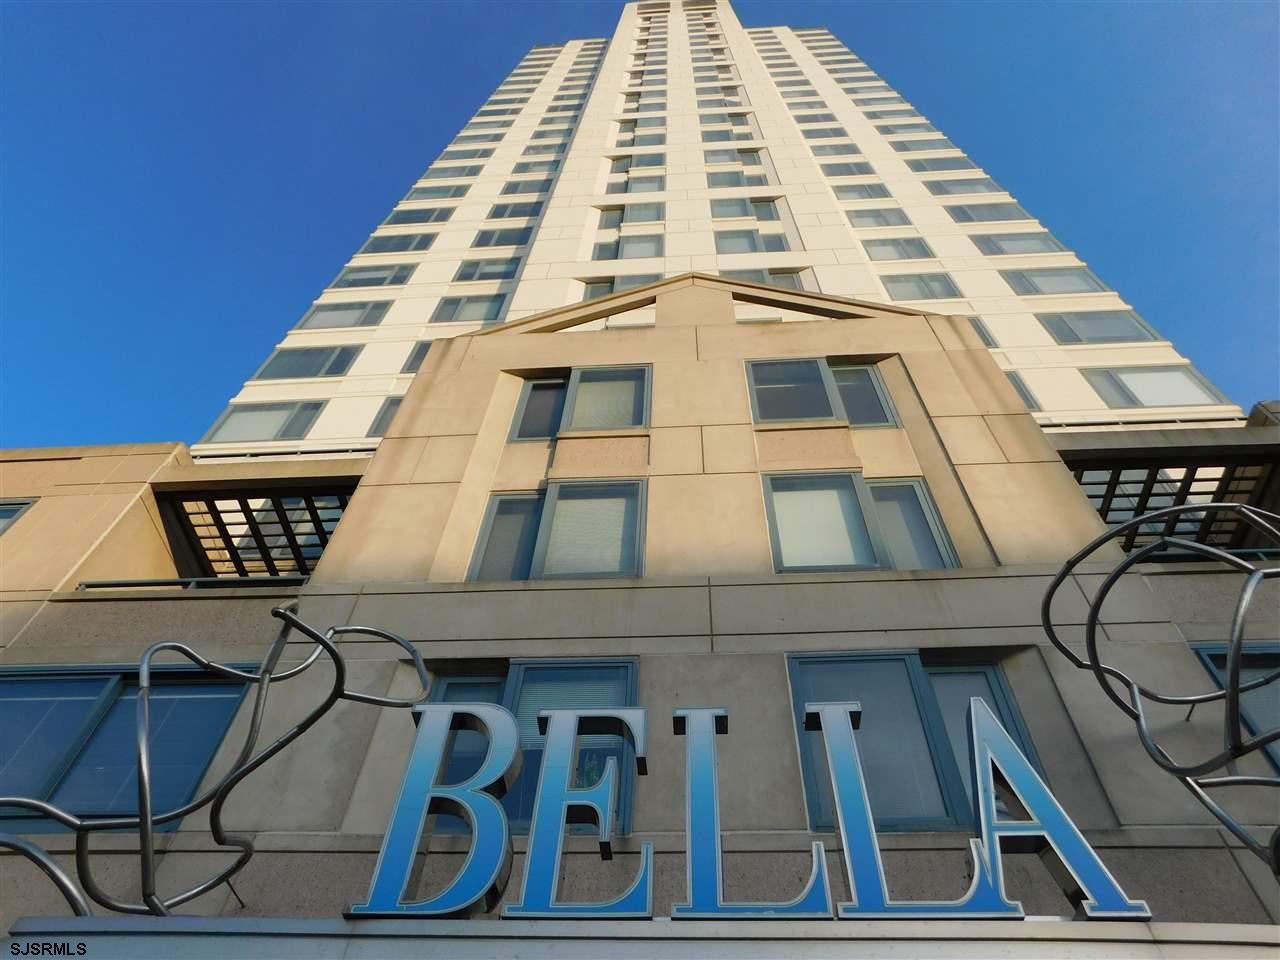 Bella, Bellissimo, spettacolare, fantastico! Whether describing in Italian or English, the Ocean & C